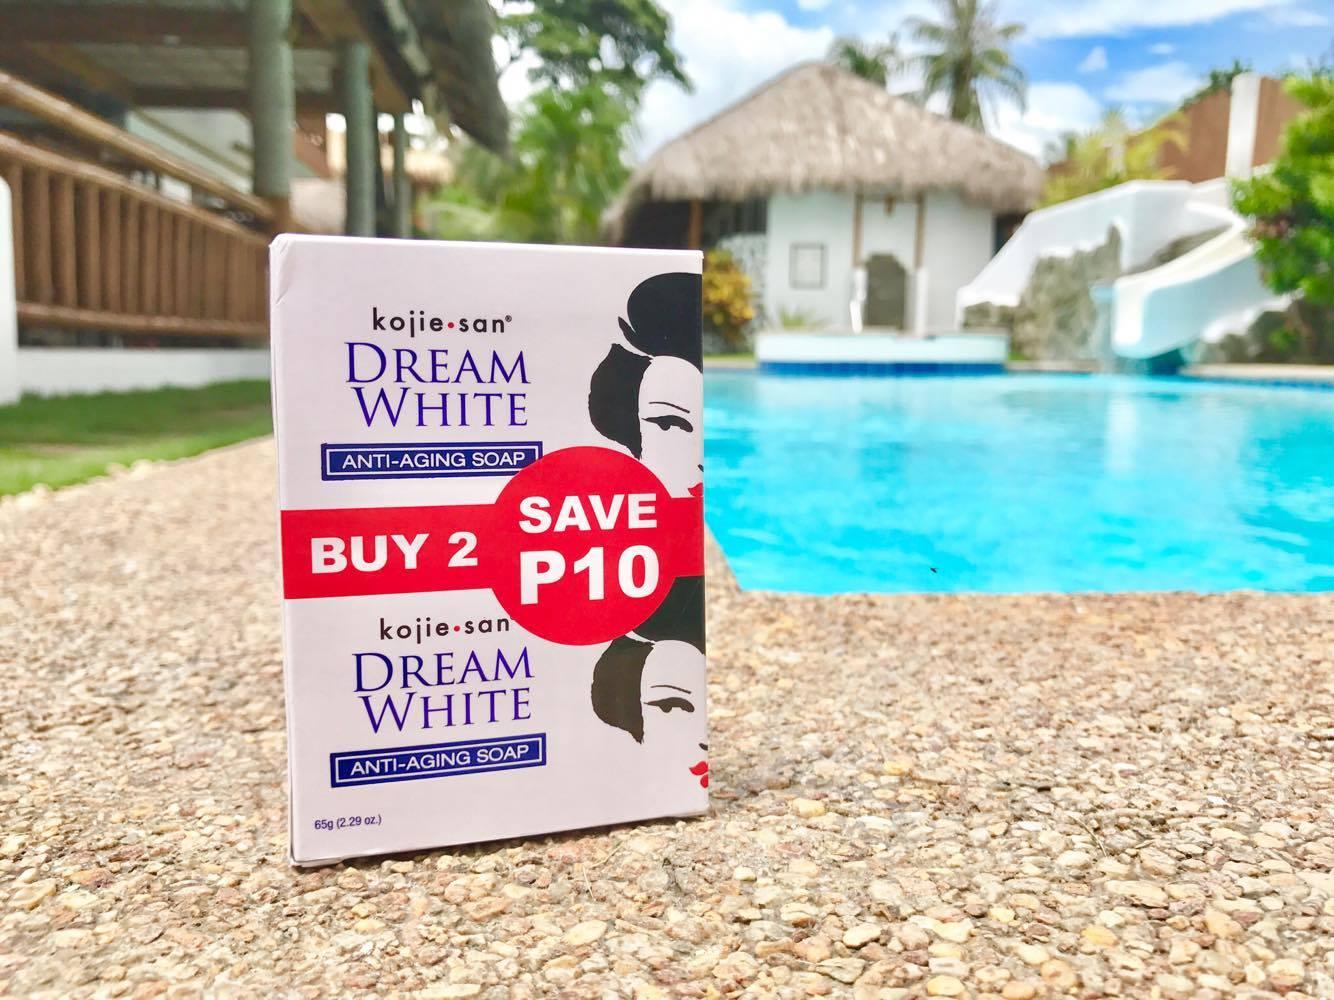 DREAM WHITE。2つで69ペソ(153円)。日本の舞妓を思わせる色白の女性がアイコン